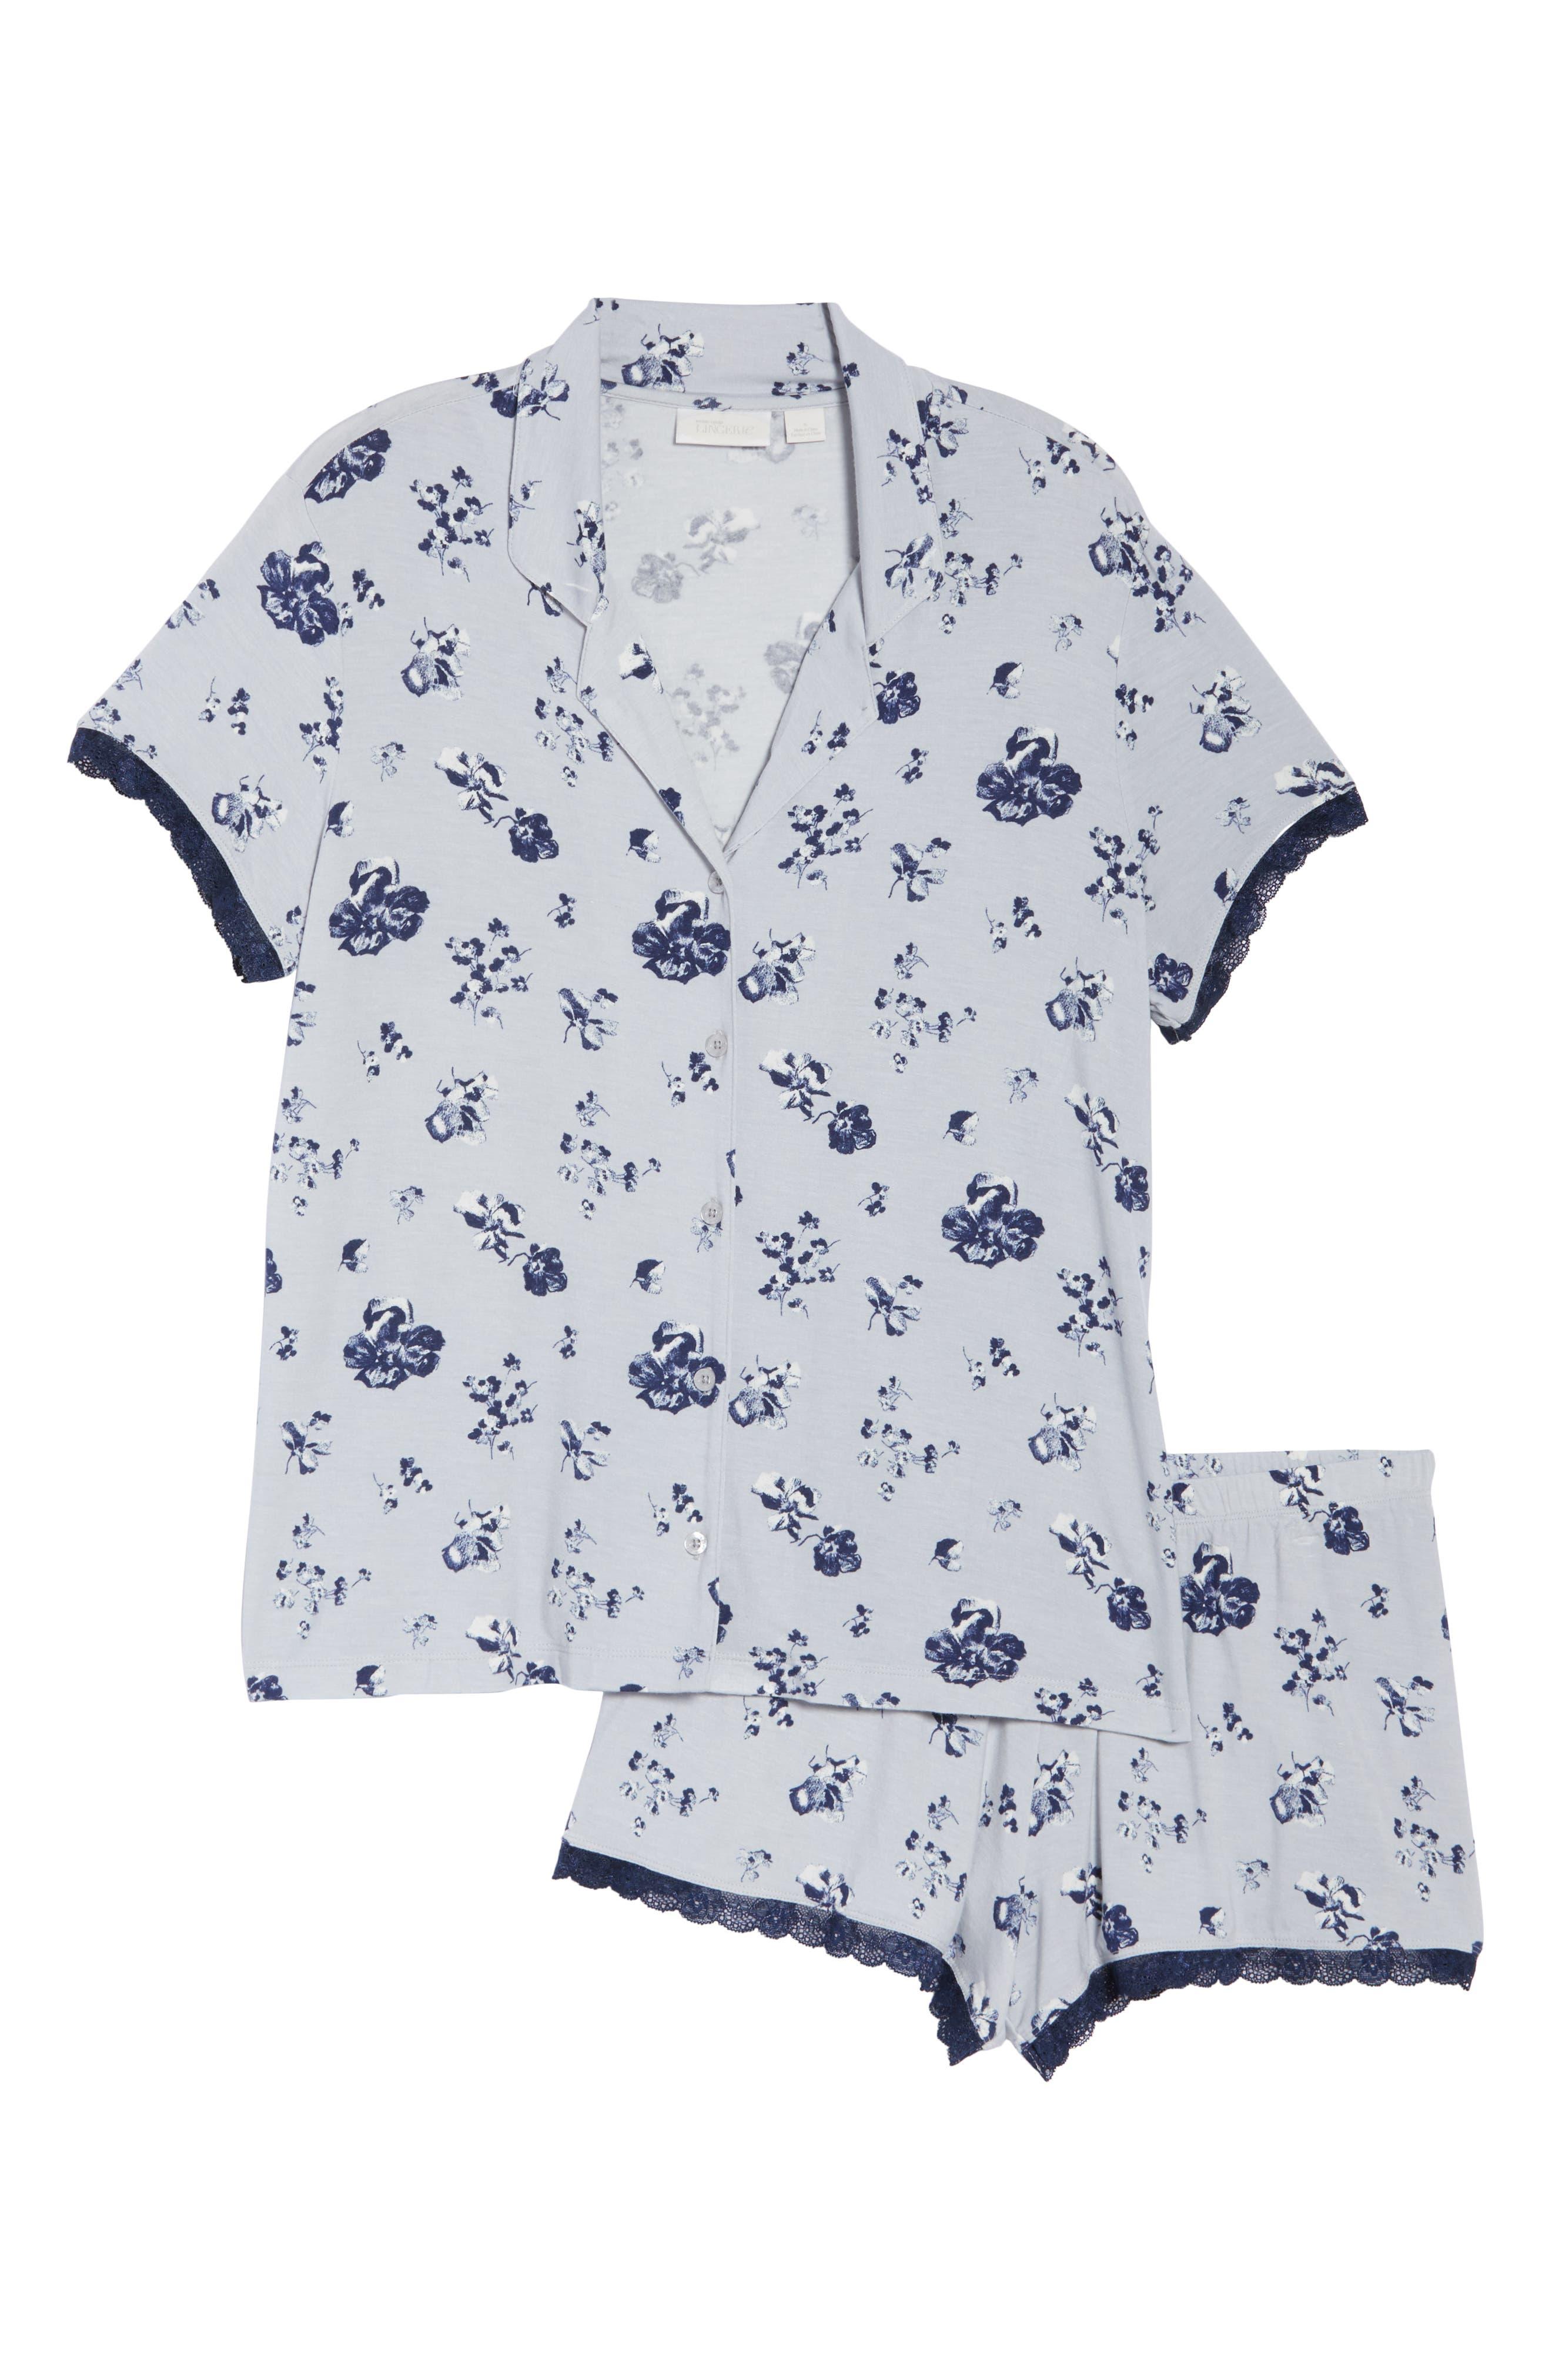 NORDSTROM LINGERIE, Moonlight Short Pajamas, Alternate thumbnail 6, color, GREY MICRO BLOOM